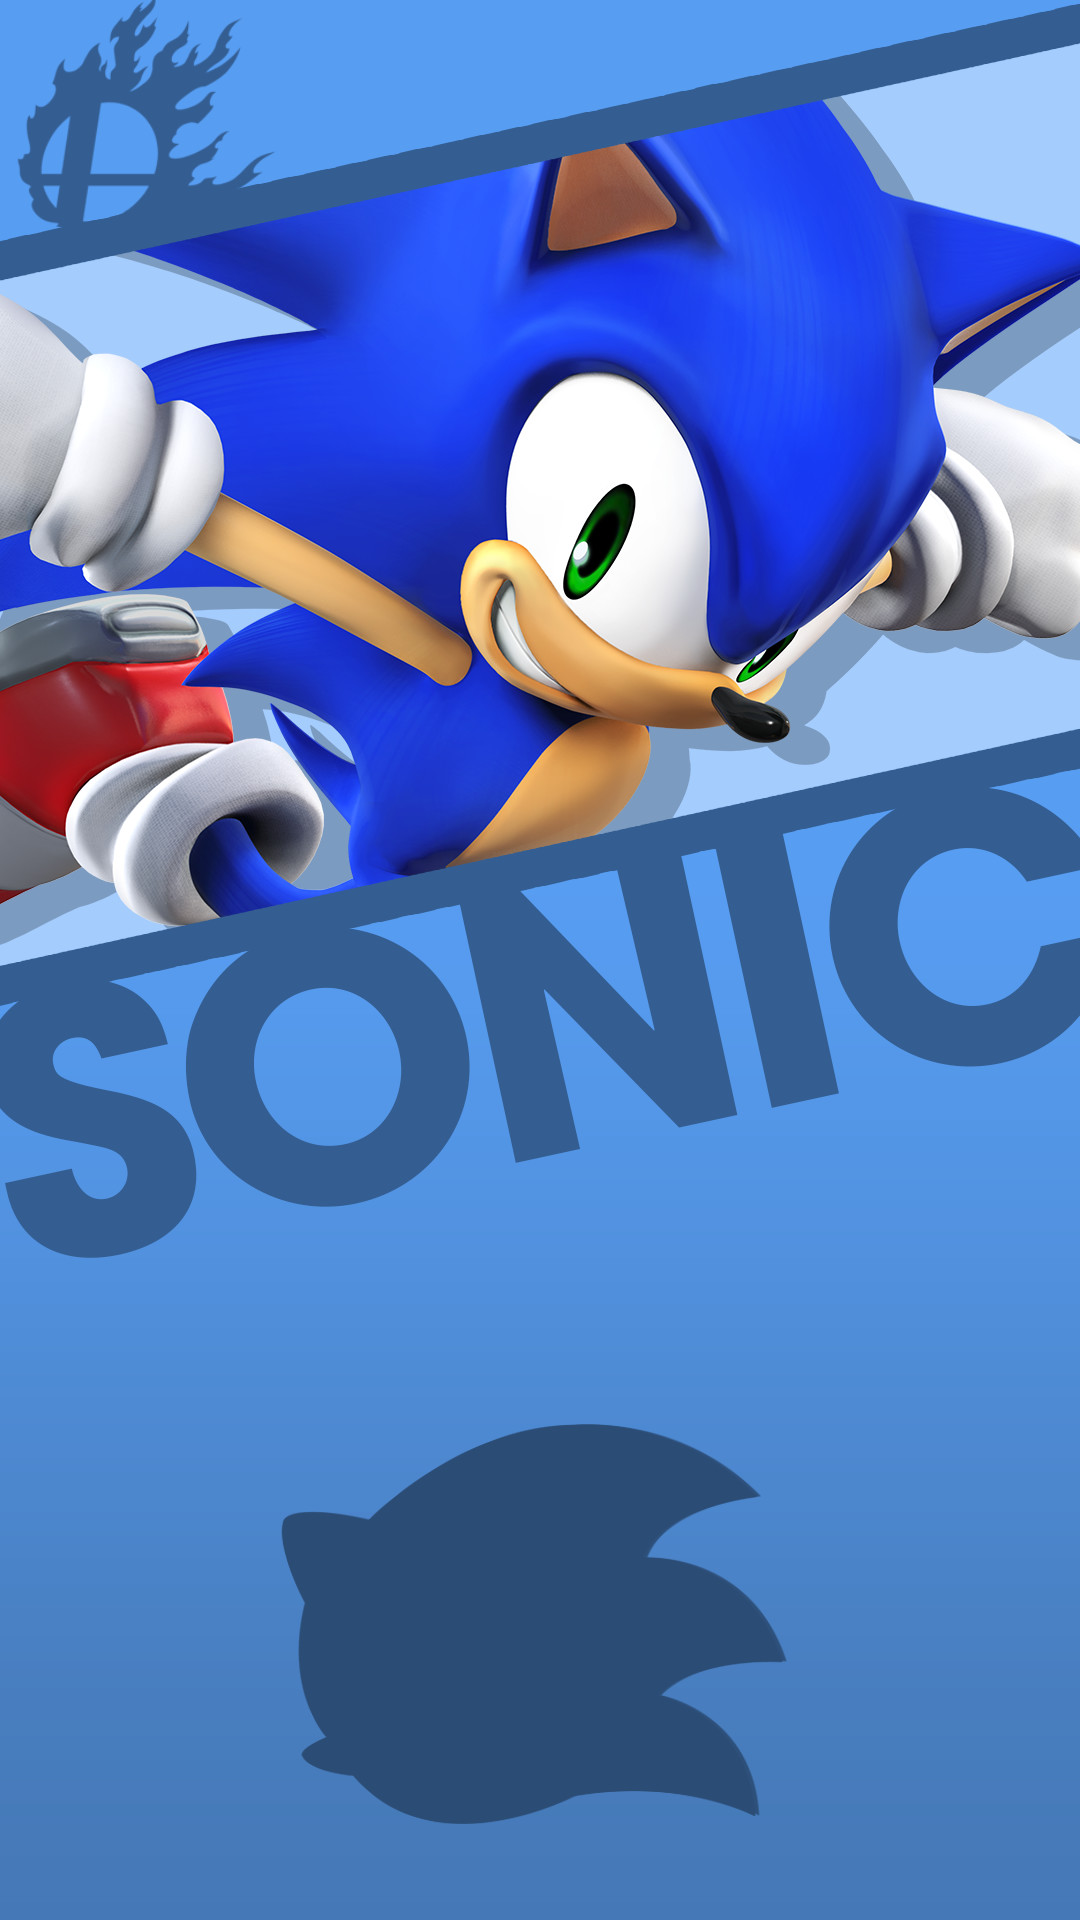 sonic the hedgehog - photo #10